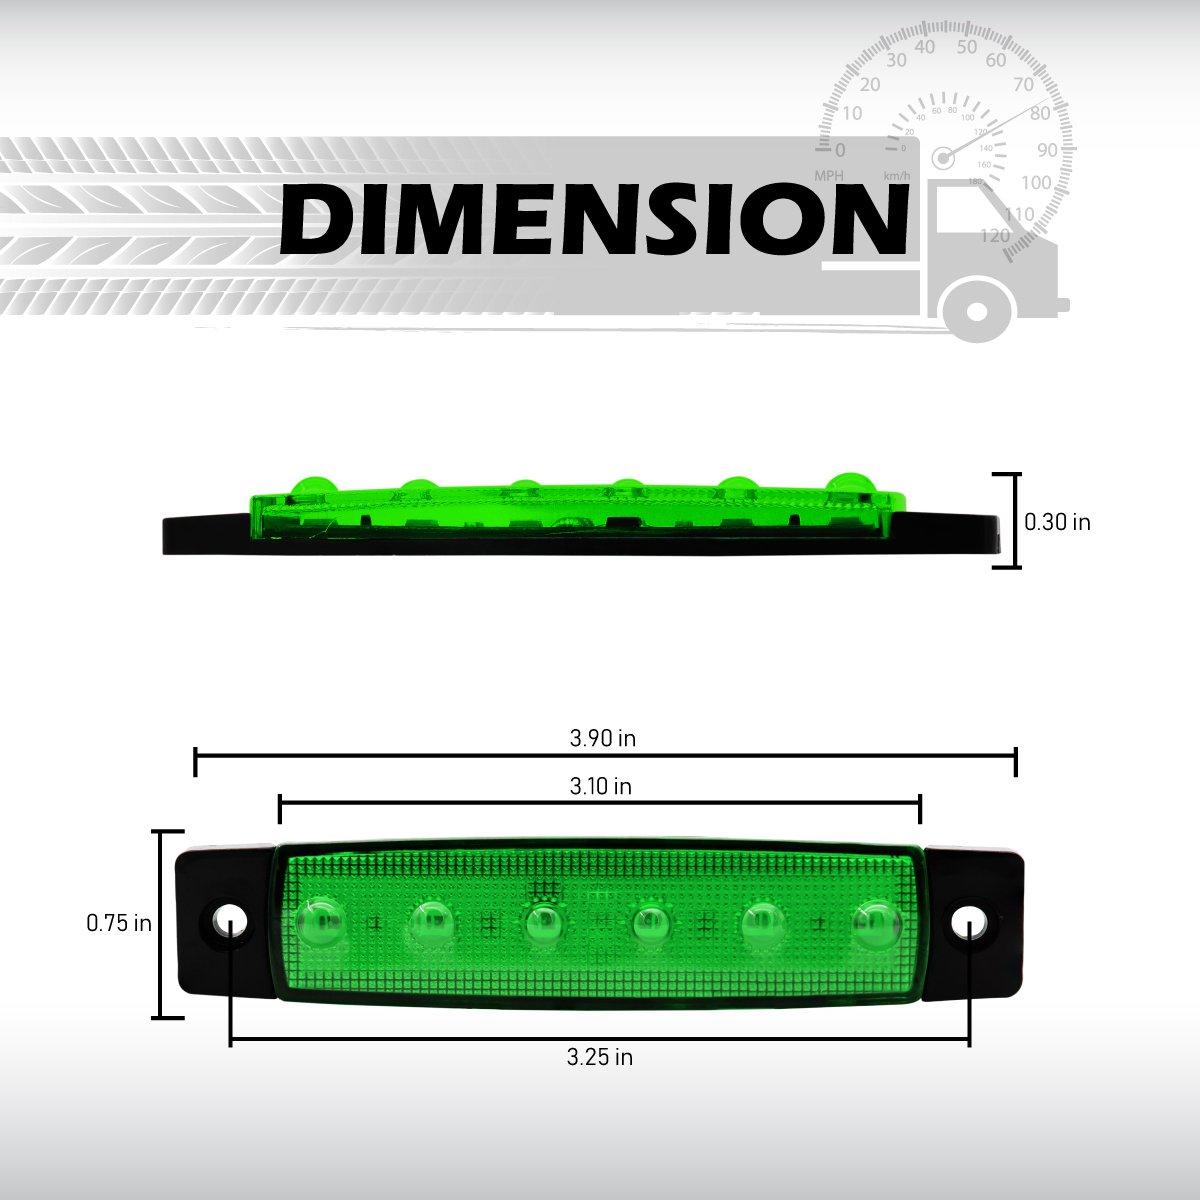 Pack of 4 3.8 Inch 2 Red /& 2 Green 6 LED Side Marker Indicators Lamp License Decoration Light Rear Fender Brake Tail Stop Truck Trailer Bus Camper SUV ATV Boat Lorry Jeep 12v DC Model TK12 Meerkatt